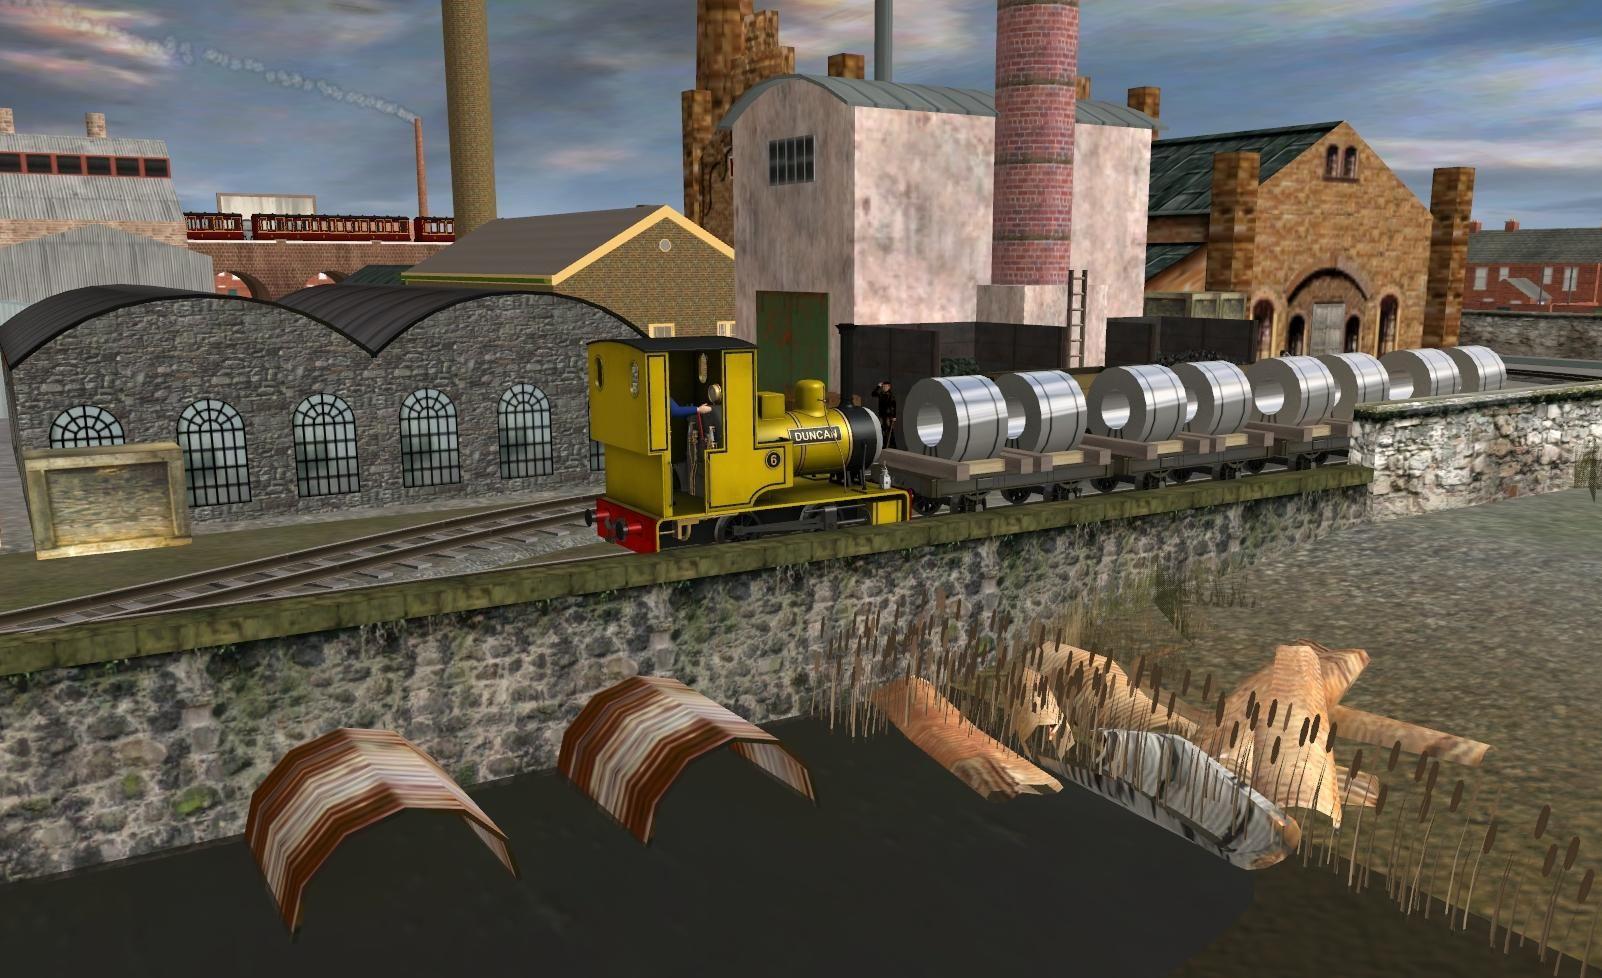 Screenshots - Trainz/MSTS/Railworks | Sodor Island 3D Forums